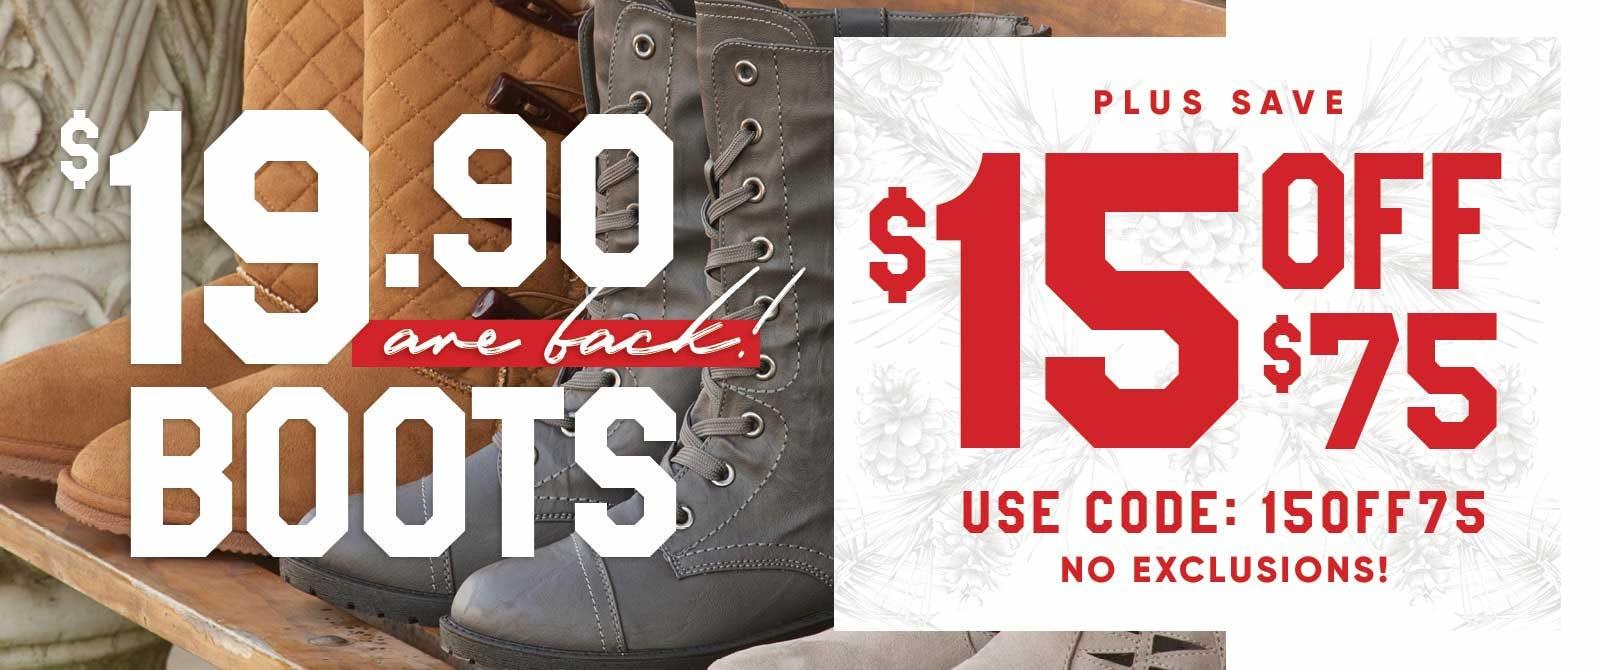 Women's boots under $20